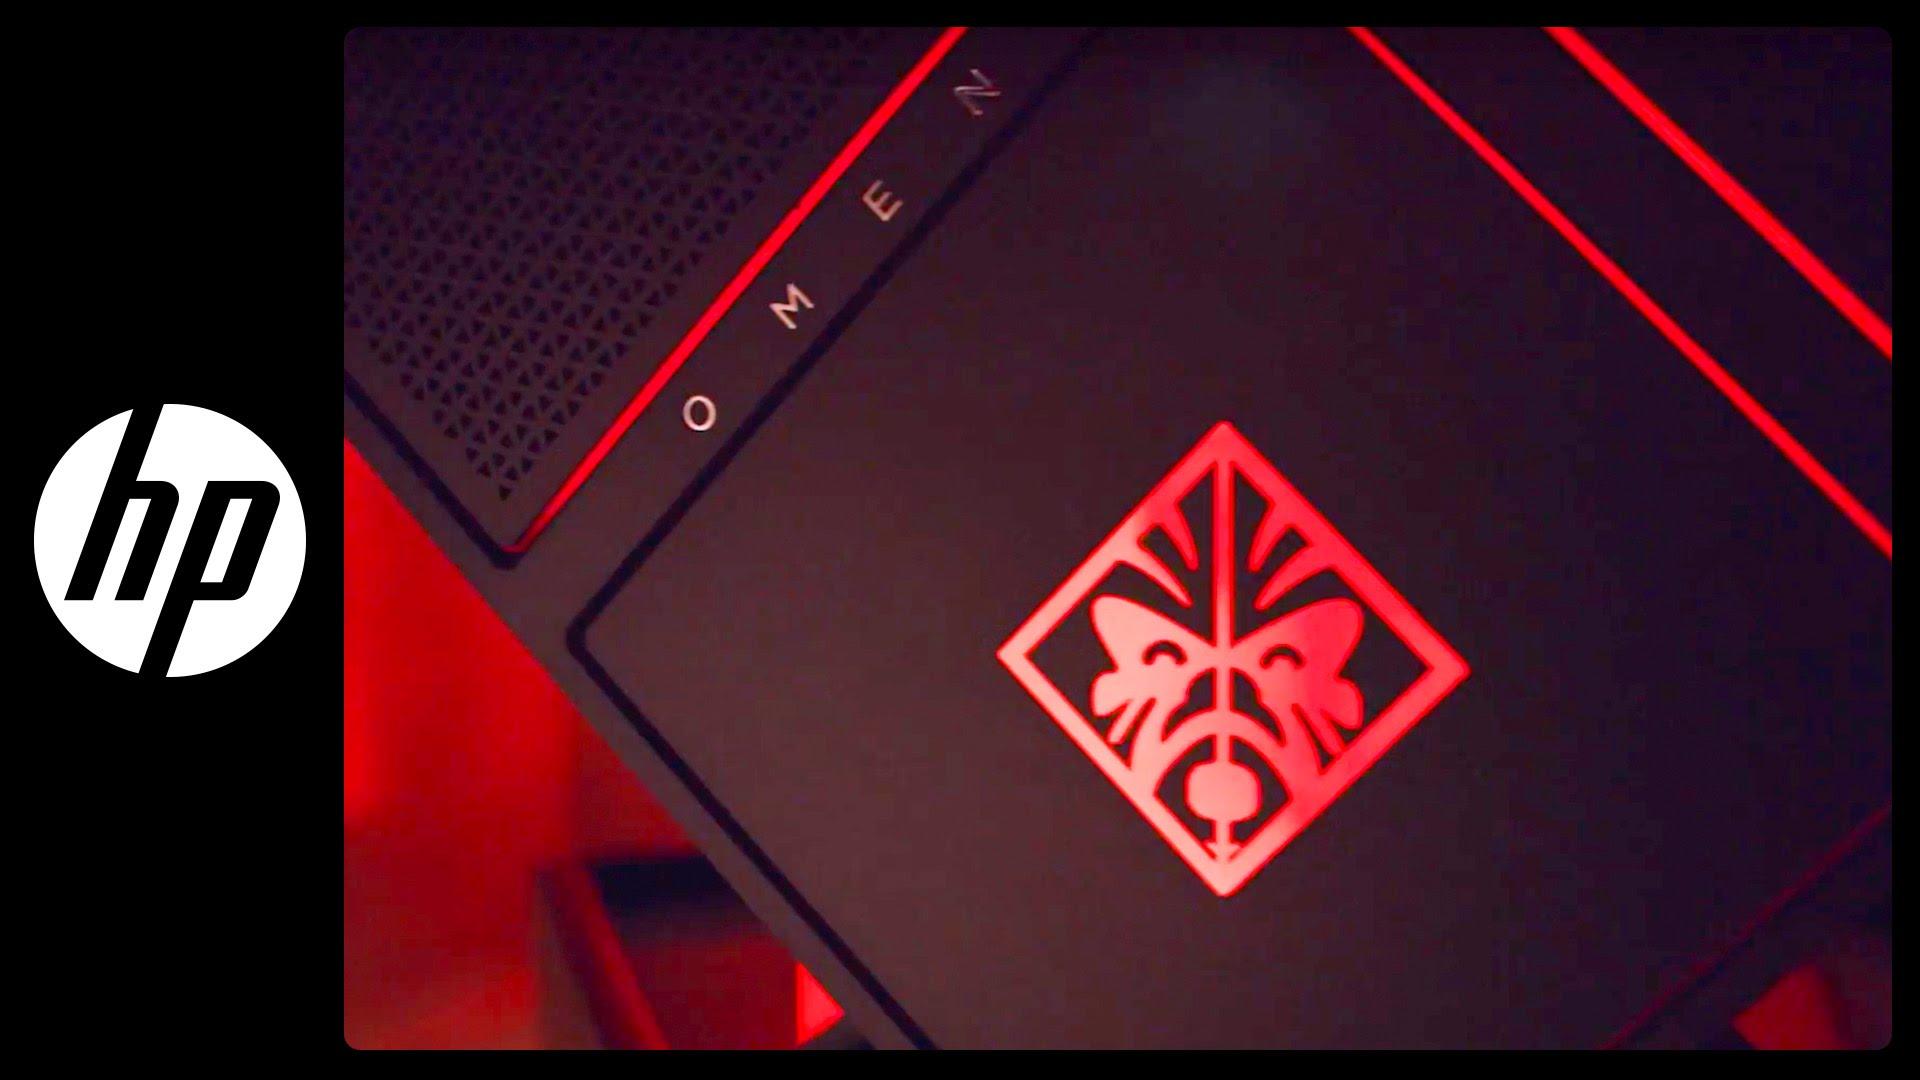 Hp Game Pubg Kualitas Hd: Gamescom 2016 : Découvrez L'impressionnant PC Gamer HP